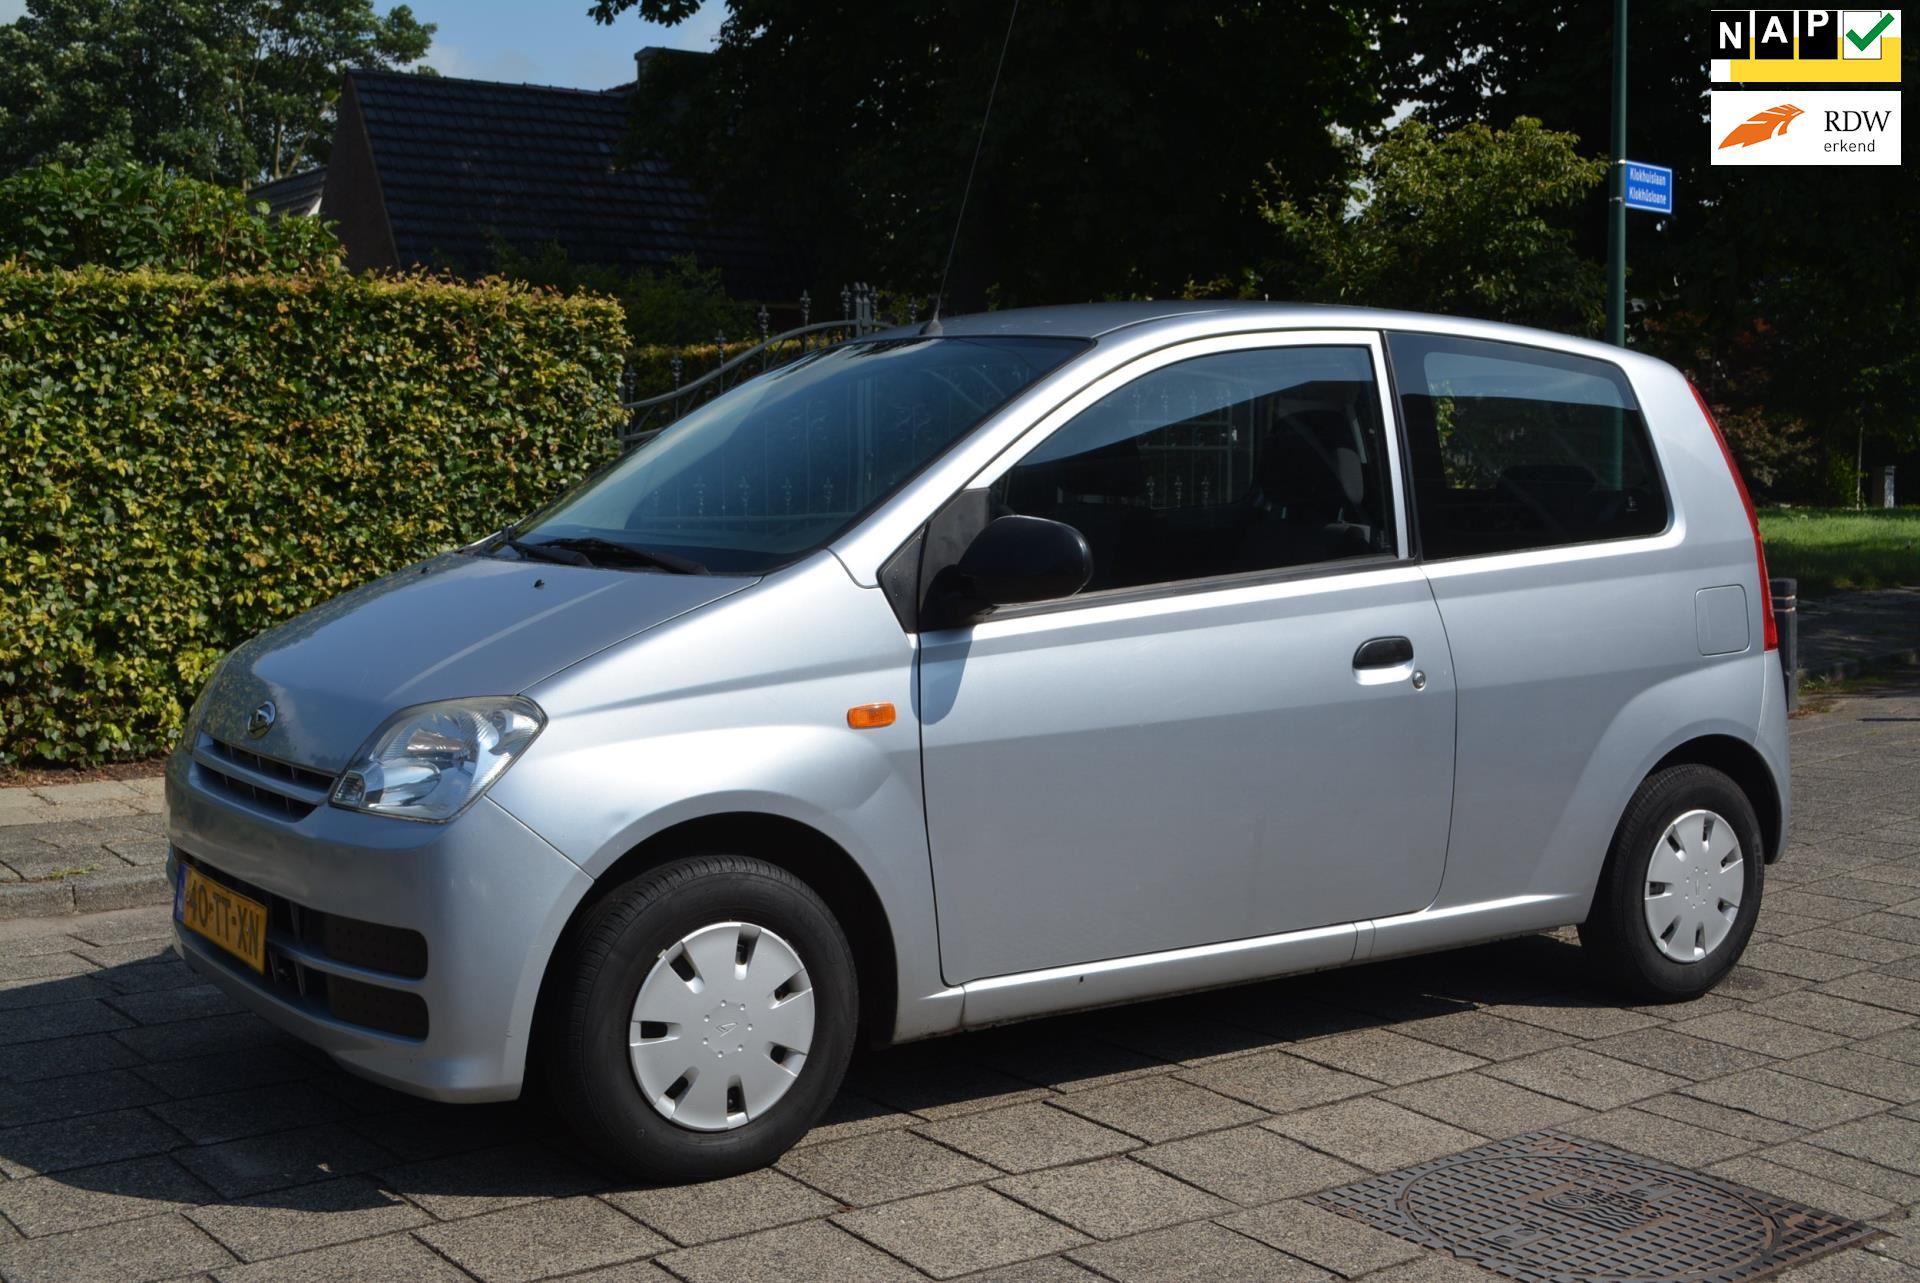 Daihatsu Cuore occasion - Autobedrijf Kiewiet (Auto 25)